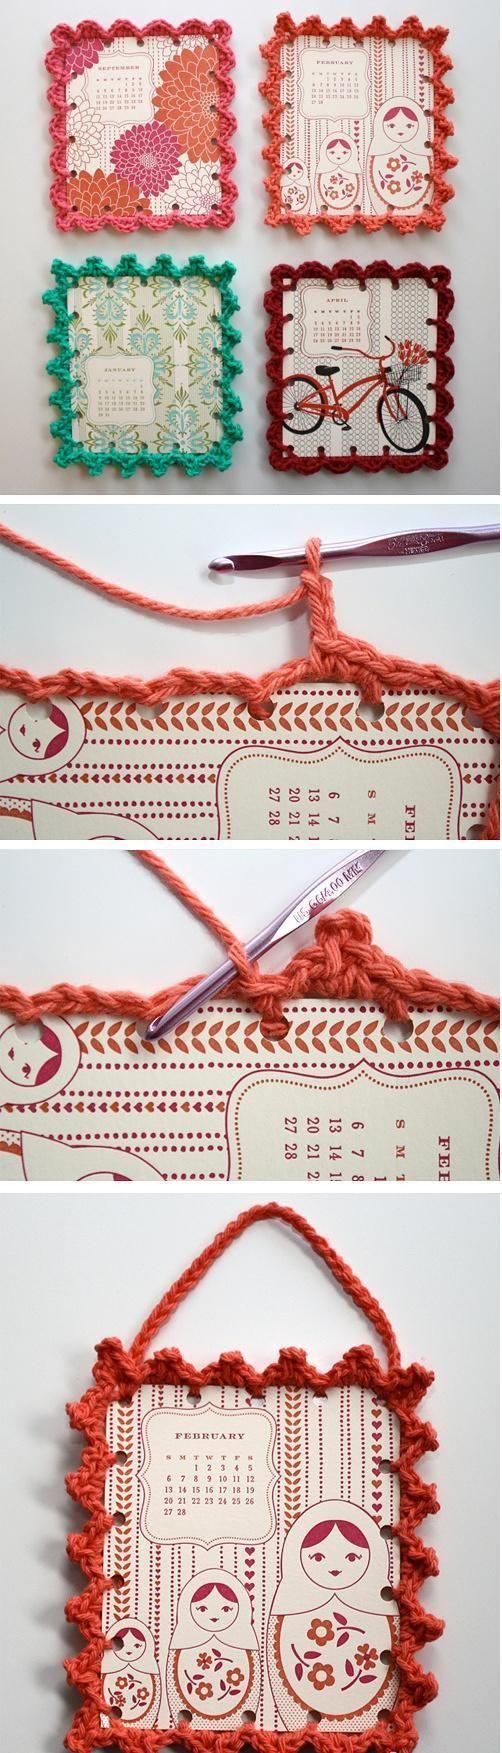 Frame Crochet - Moldura de Croche